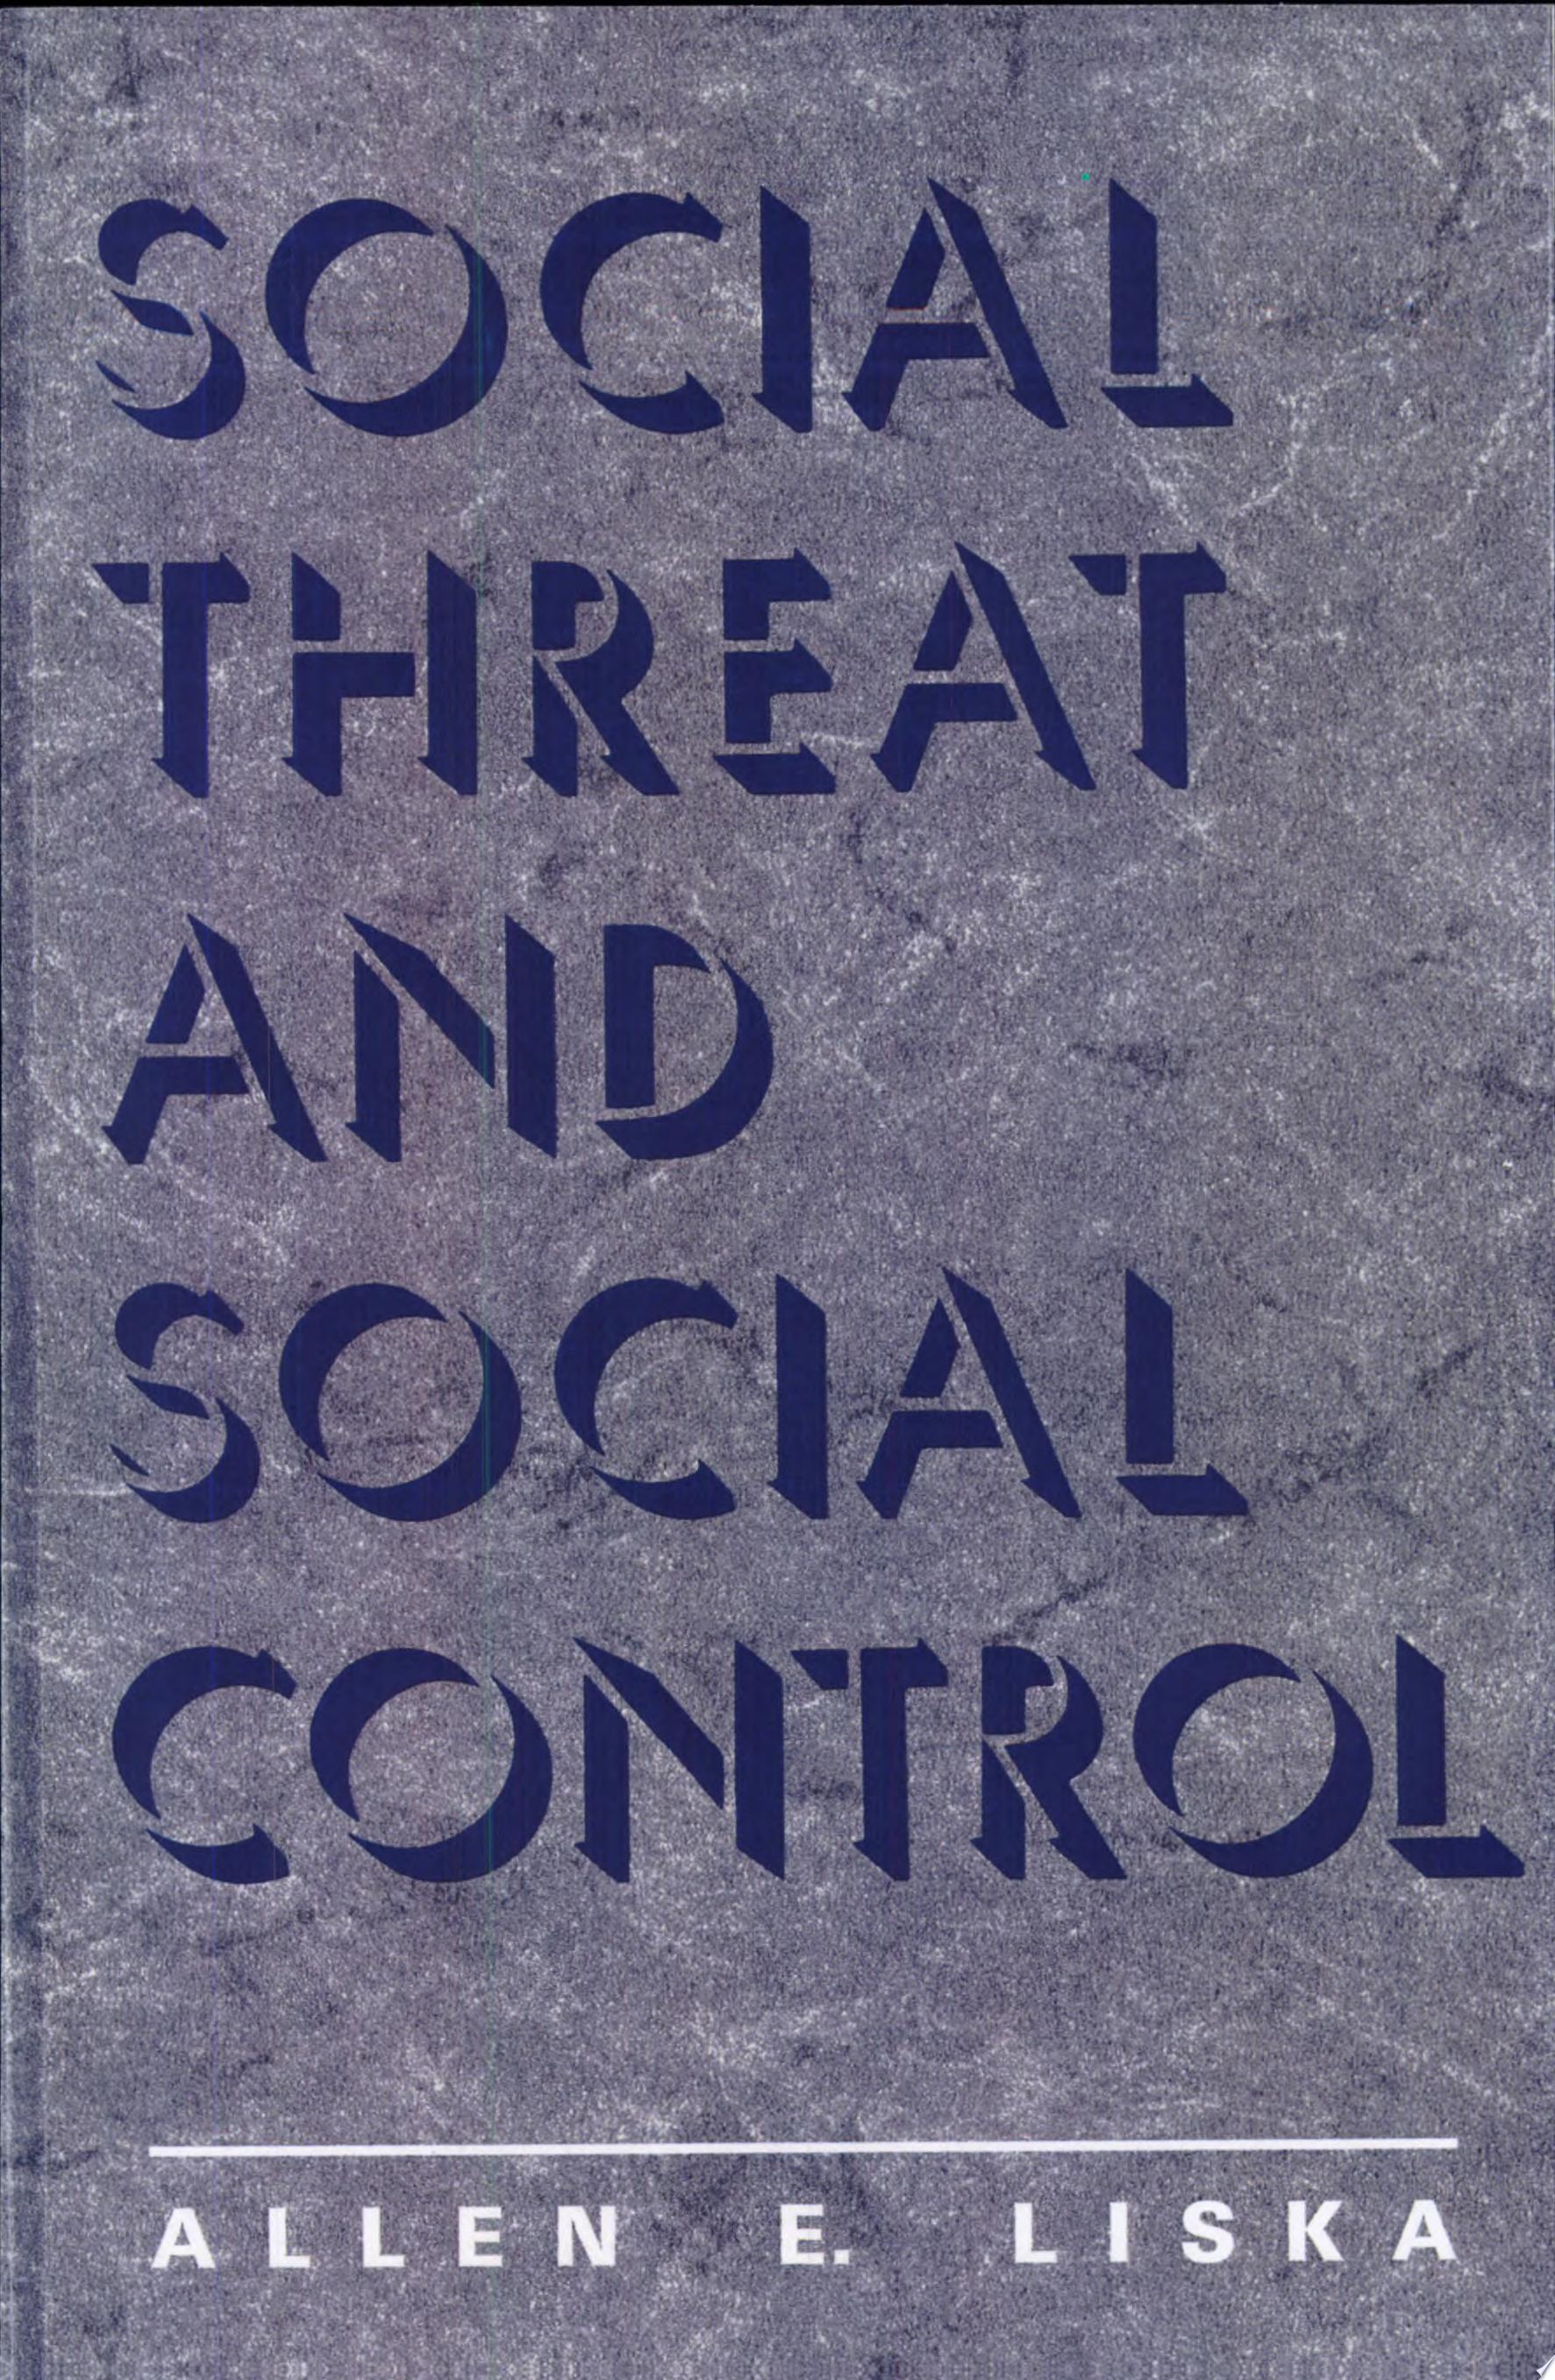 Social Threat and Social Control